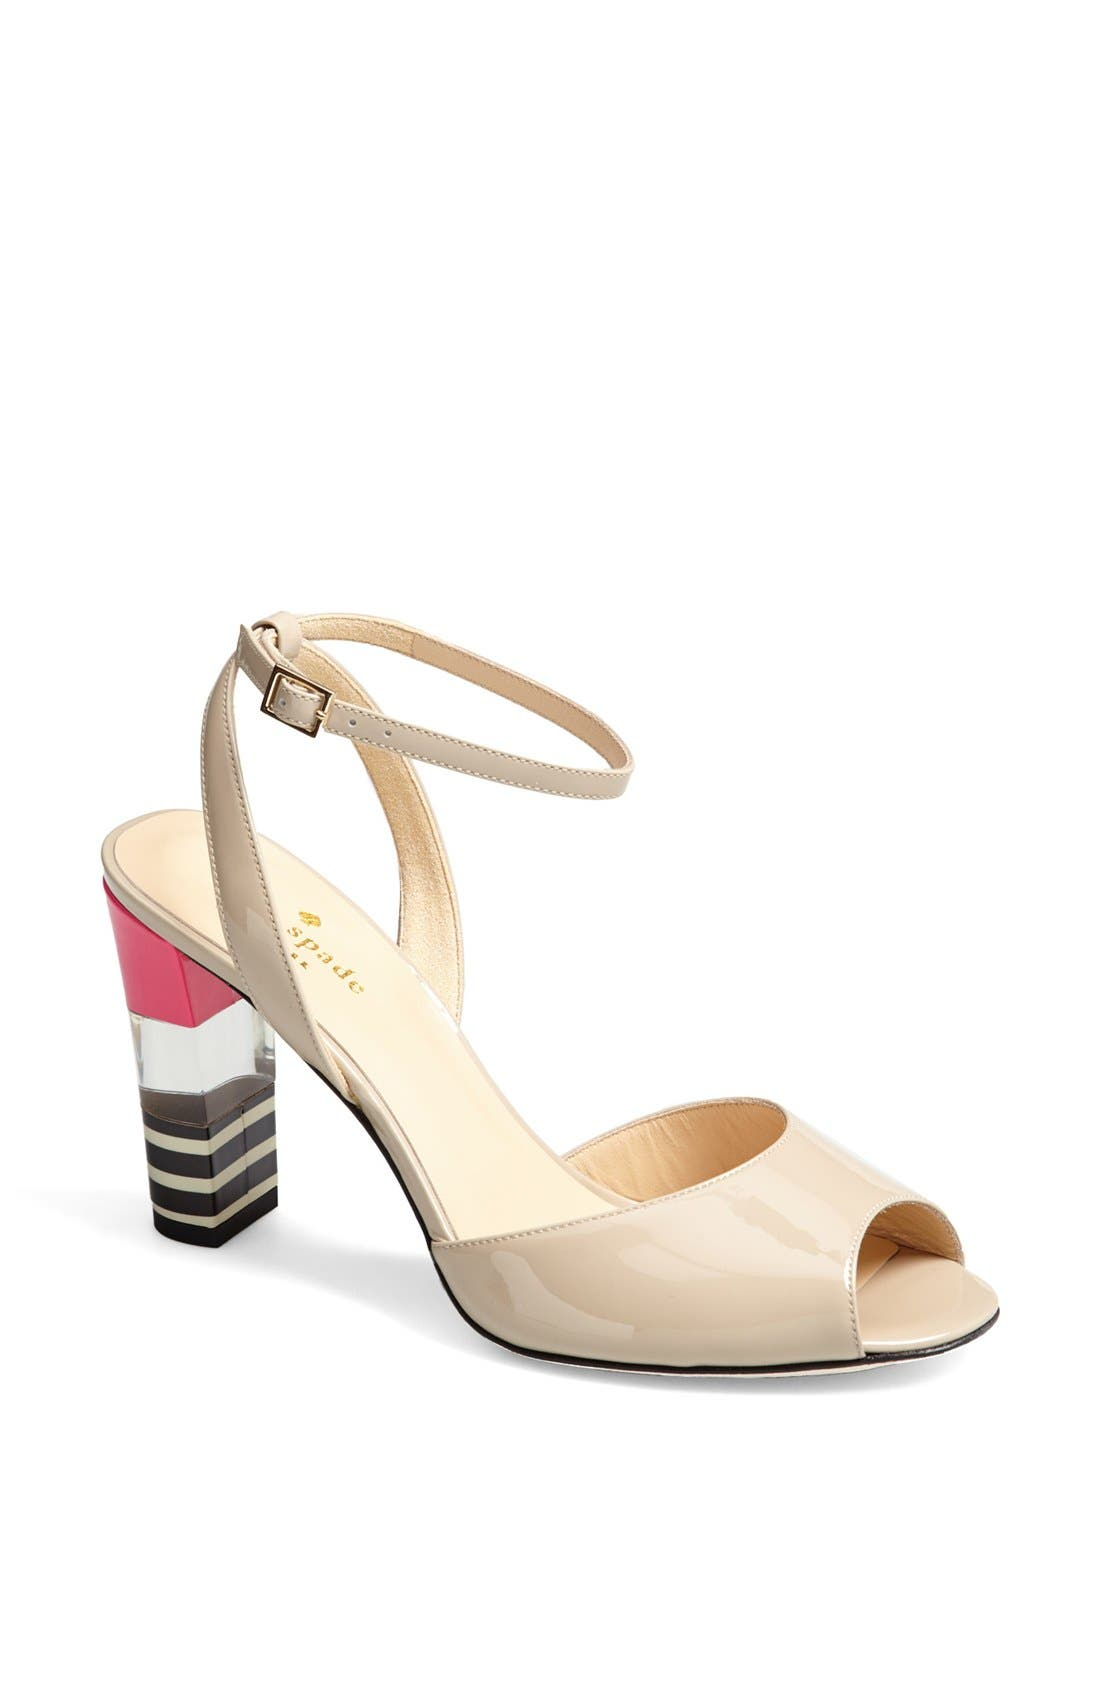 Main Image - kate spade new york 'ice' leather sandal